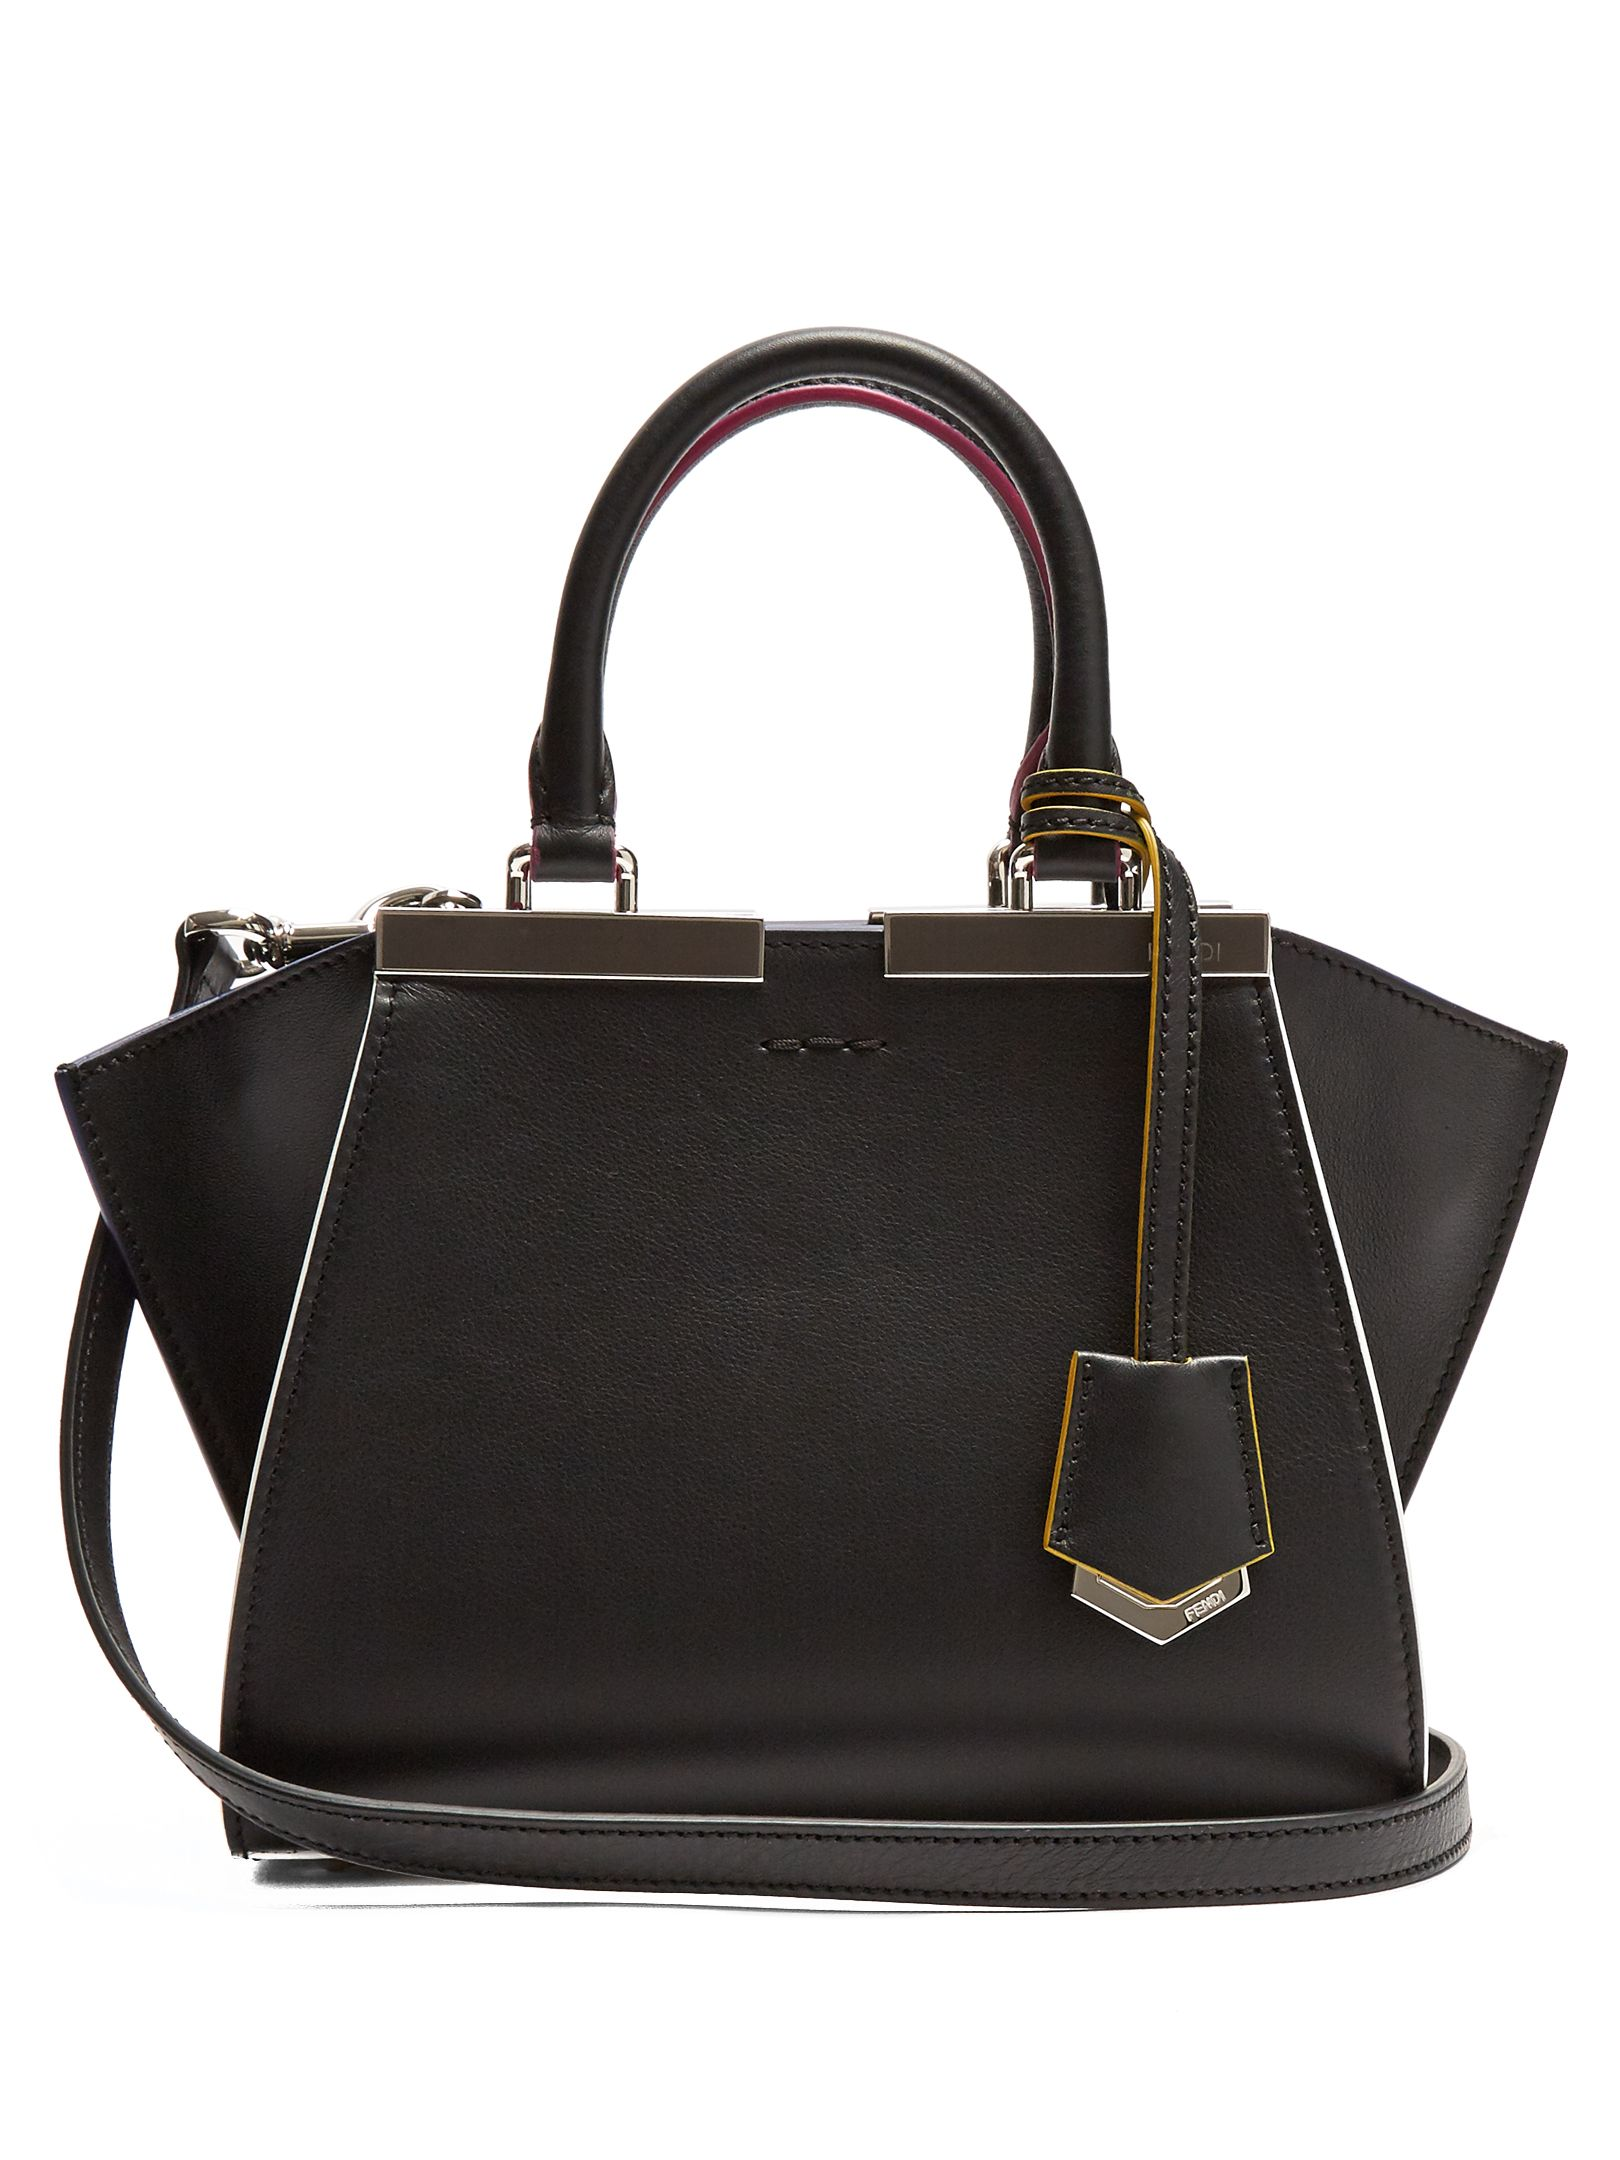 ebcb459cea Fendi 3Jours small leather cross-body bag